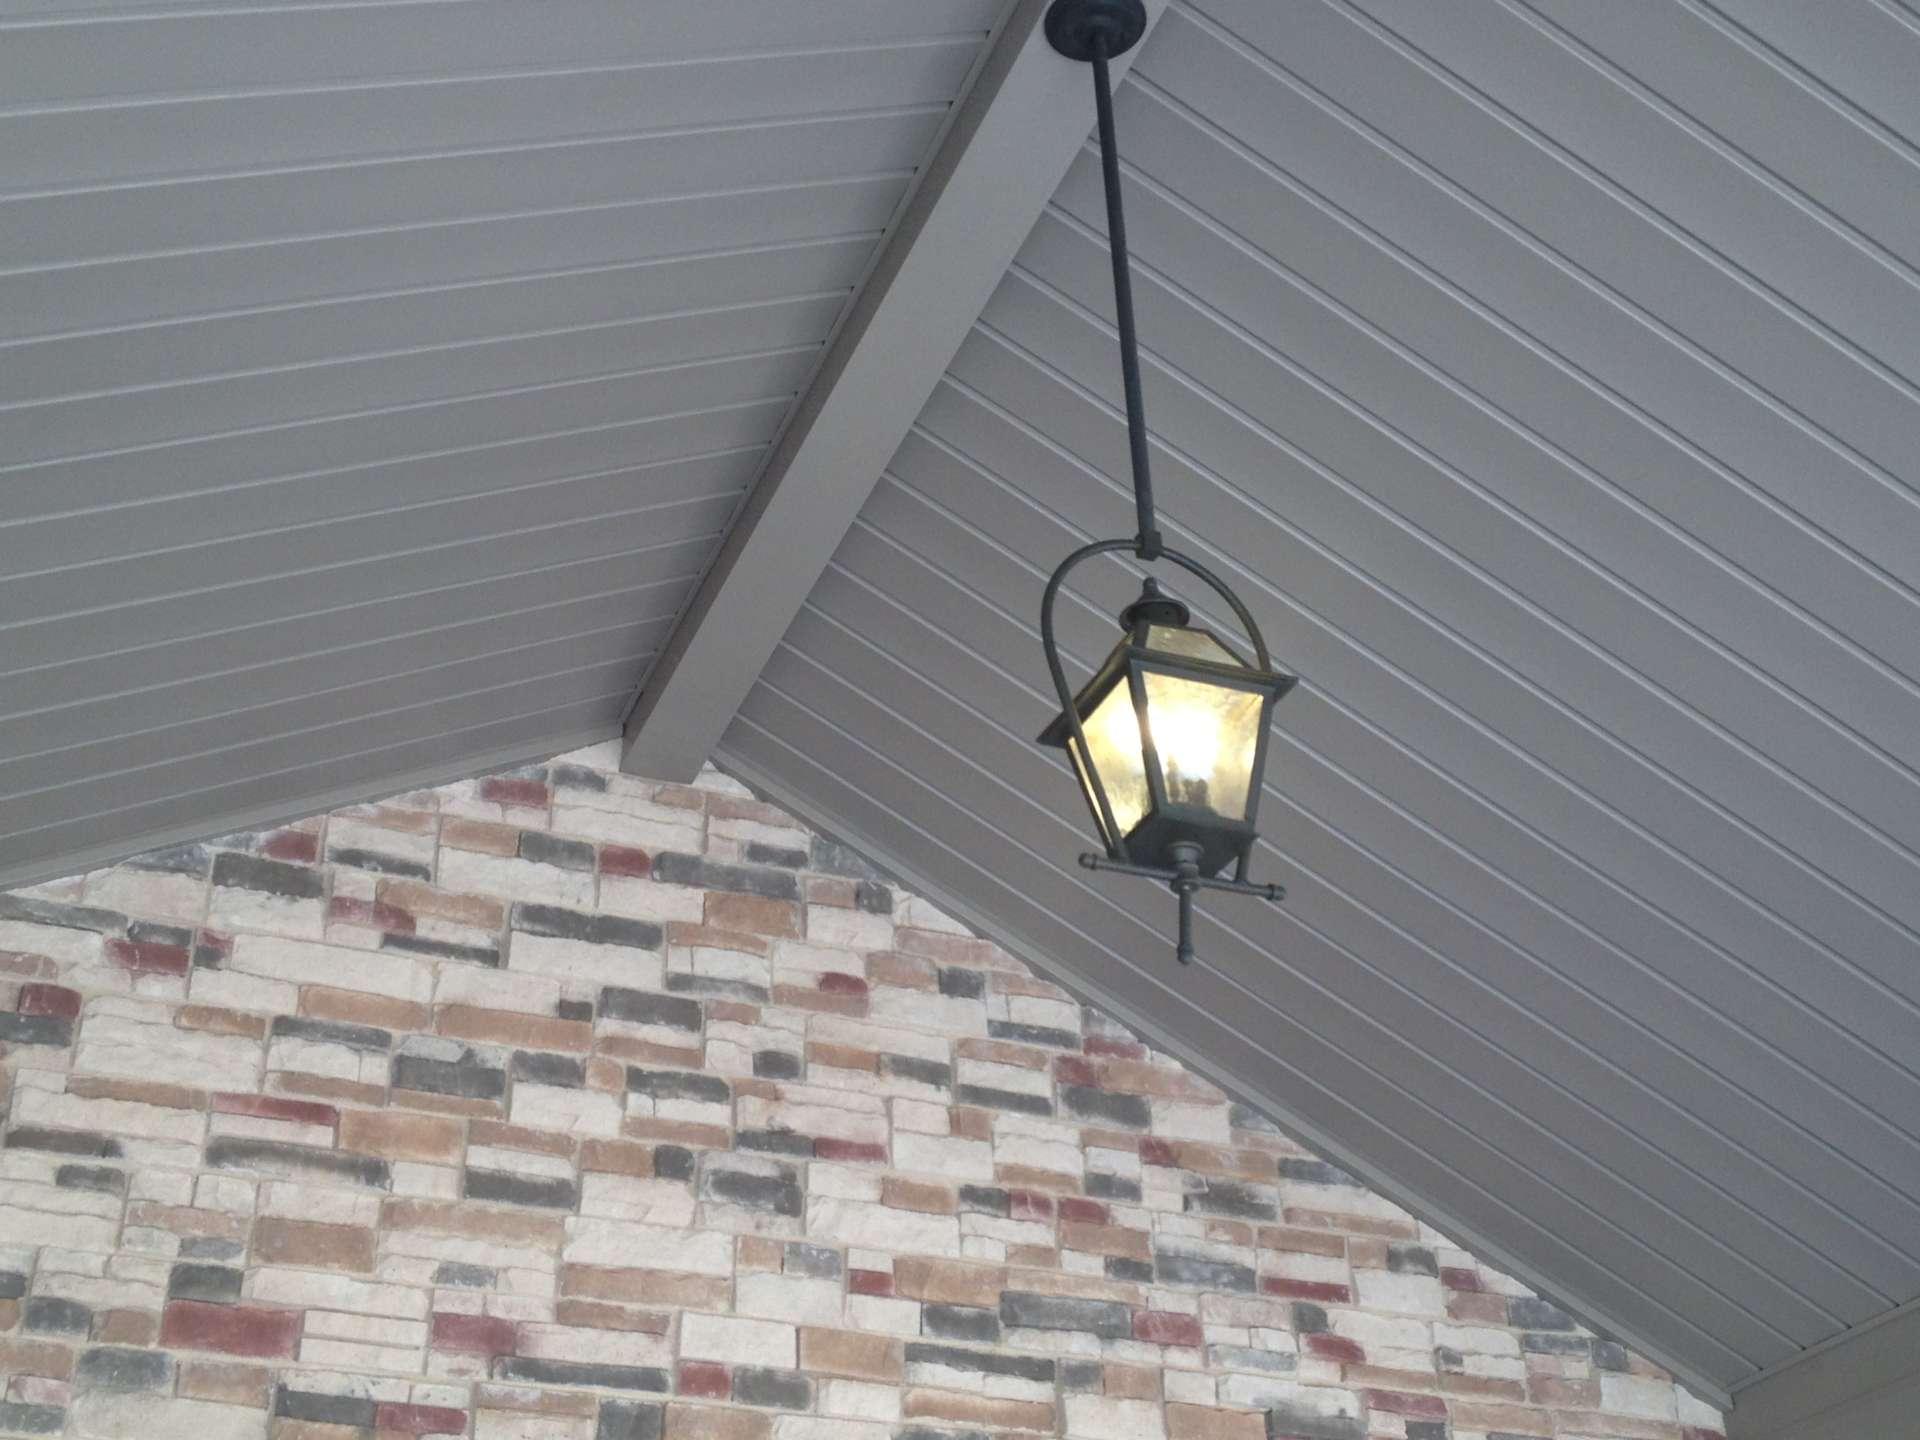 Porch Light with masonry